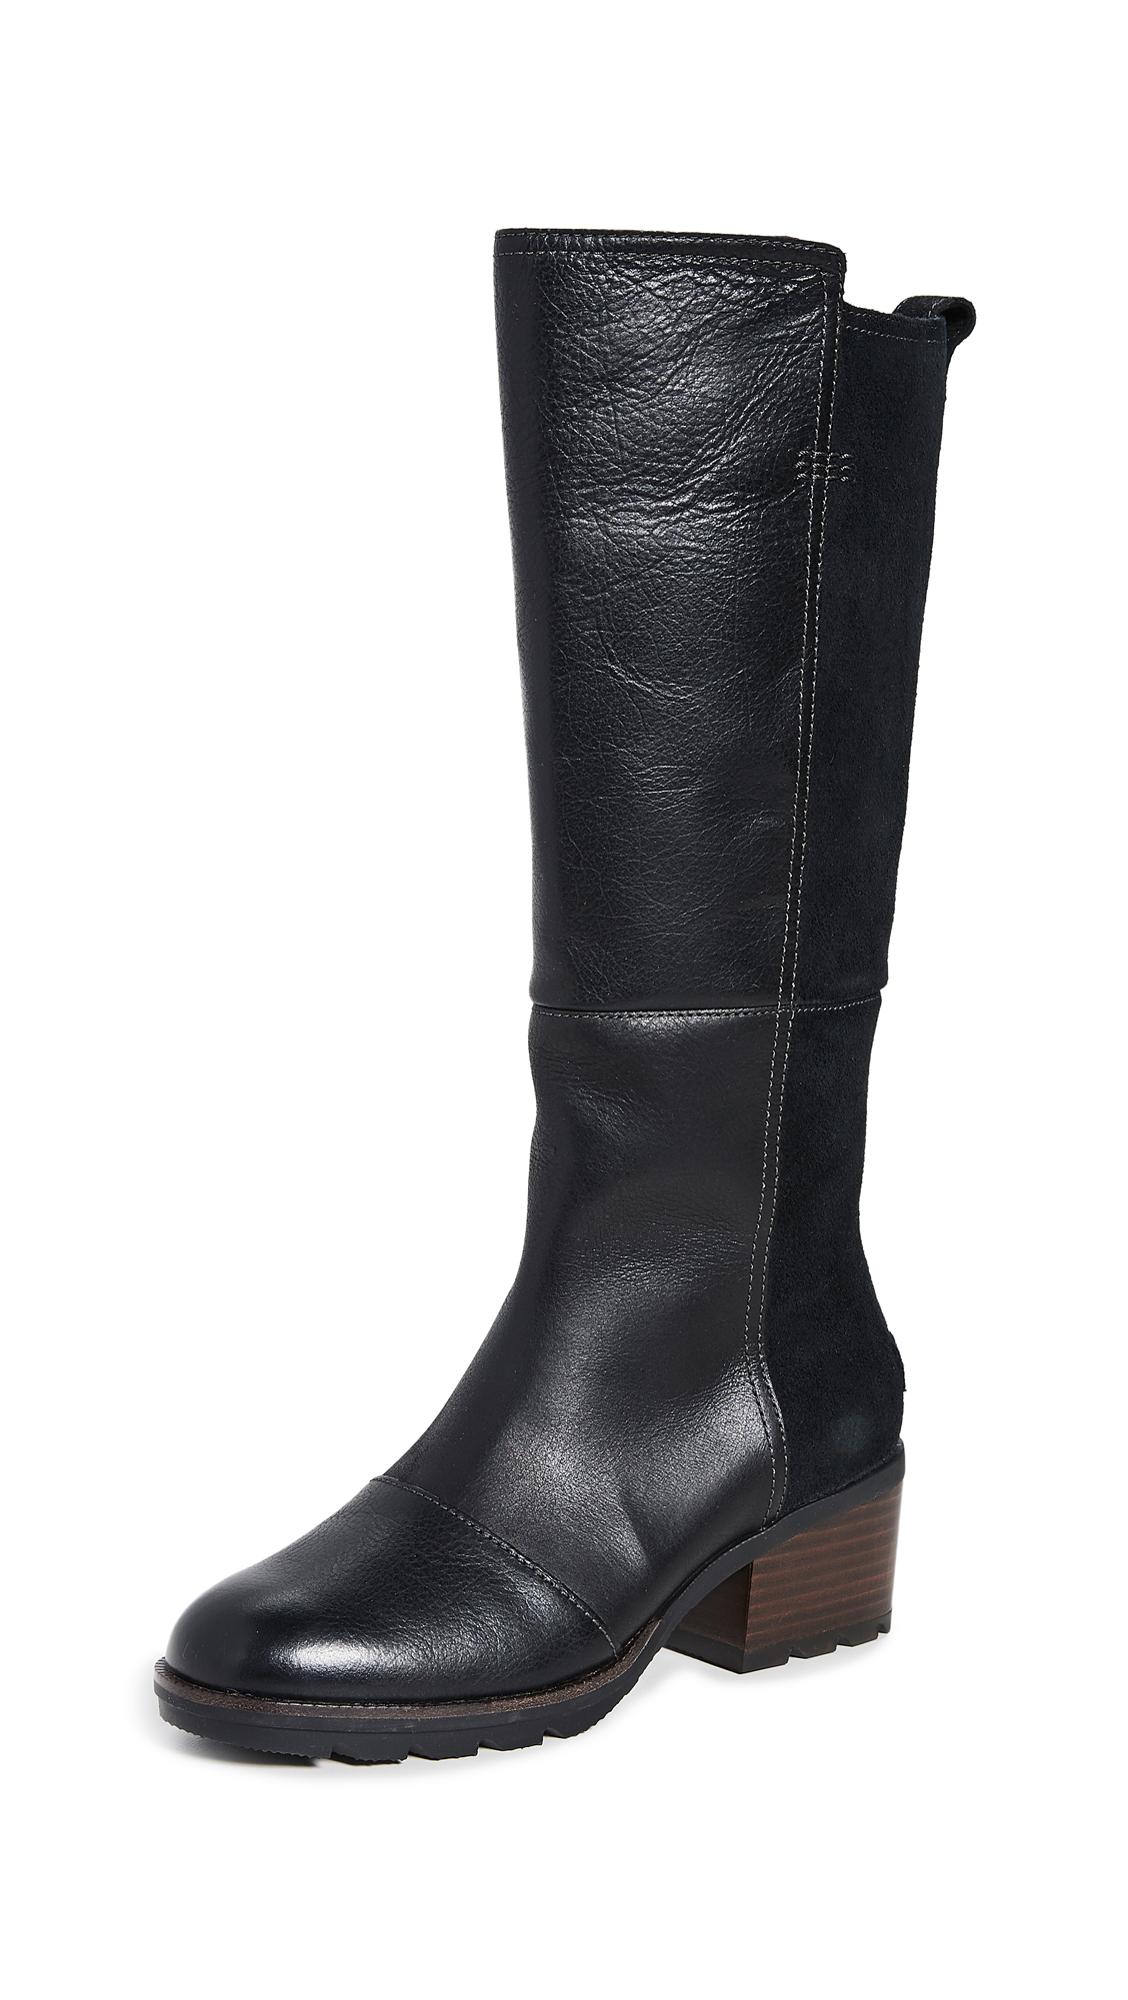 Buy Sorel Cate Tall Boots online, shop Sorel